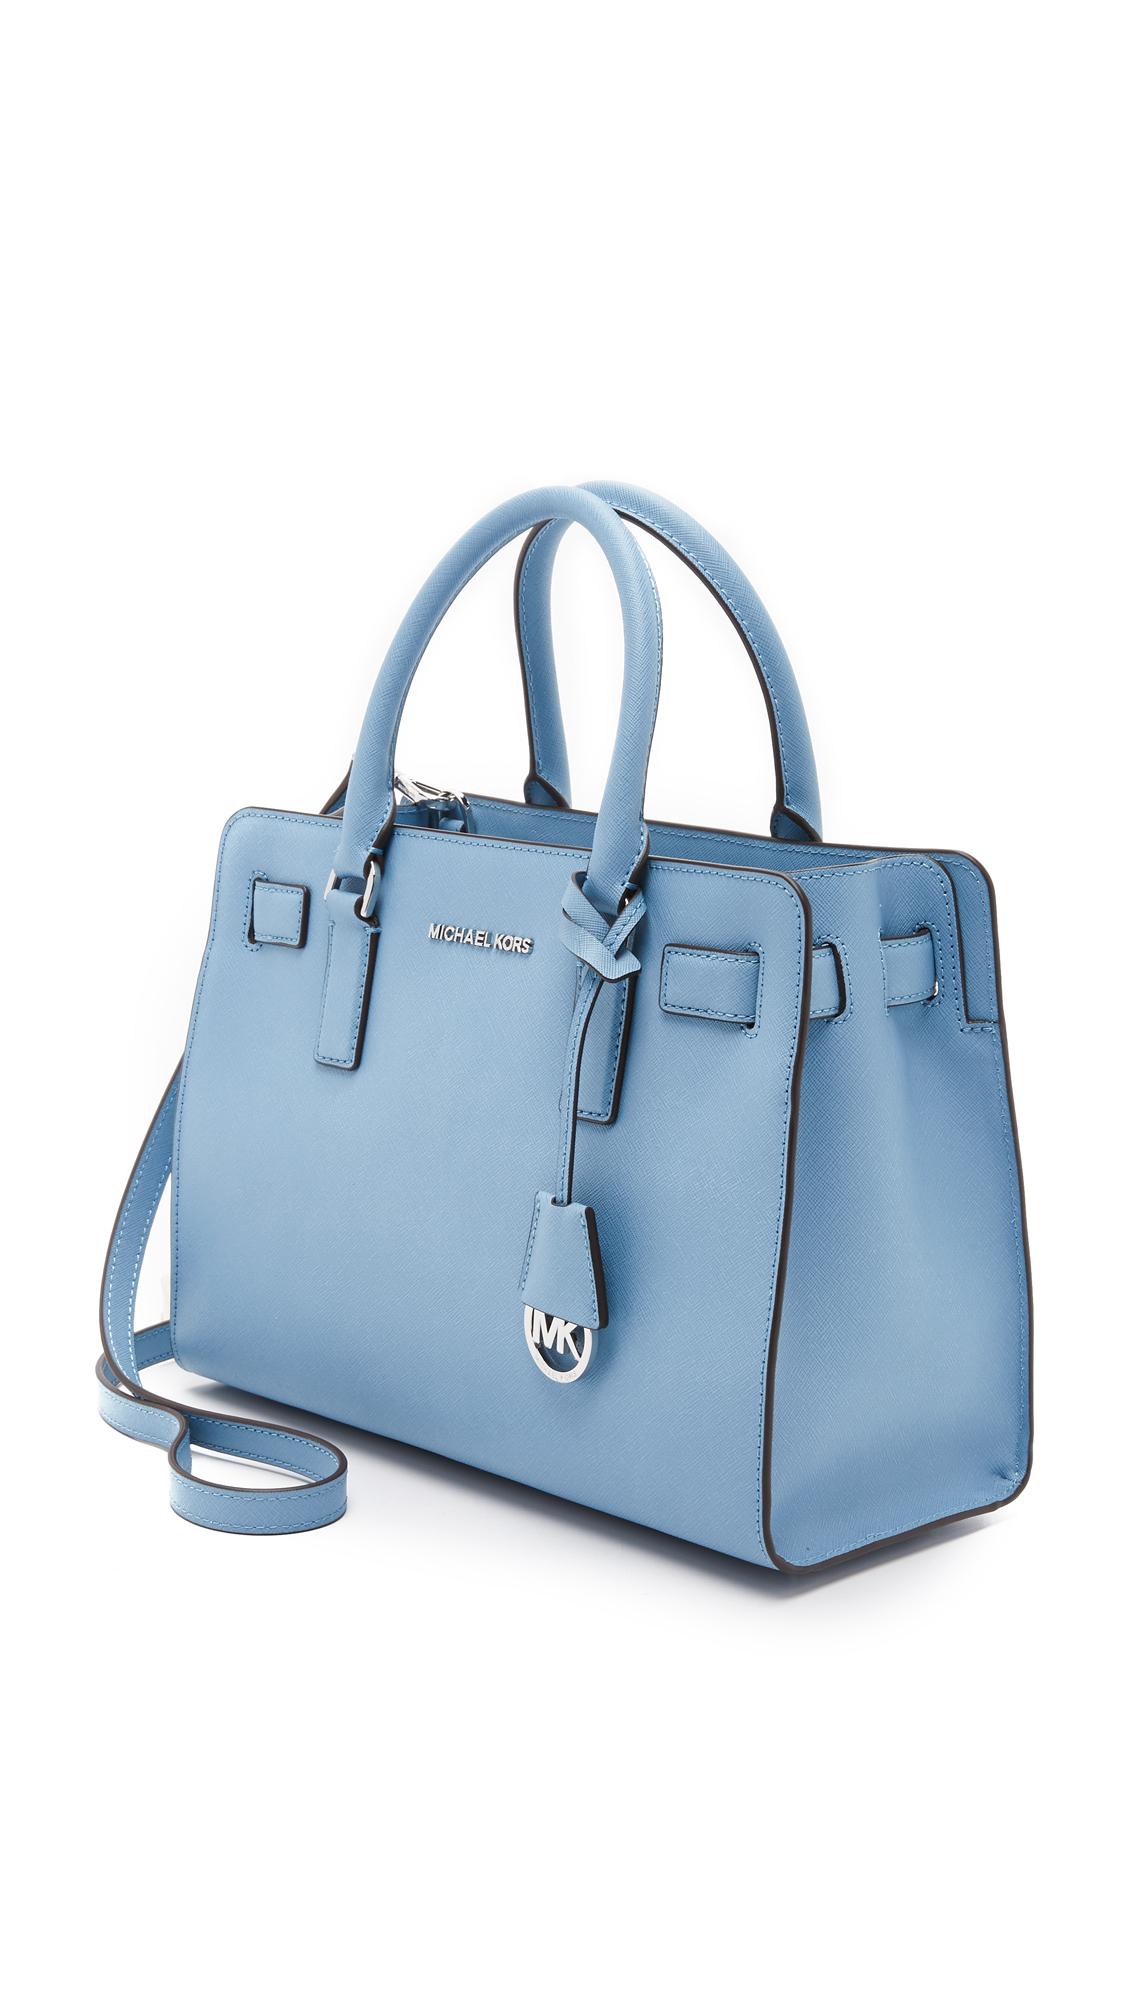 becf801622d0 ... cheap michael michael kors dillon satchel in blue lyst d80ce 25445